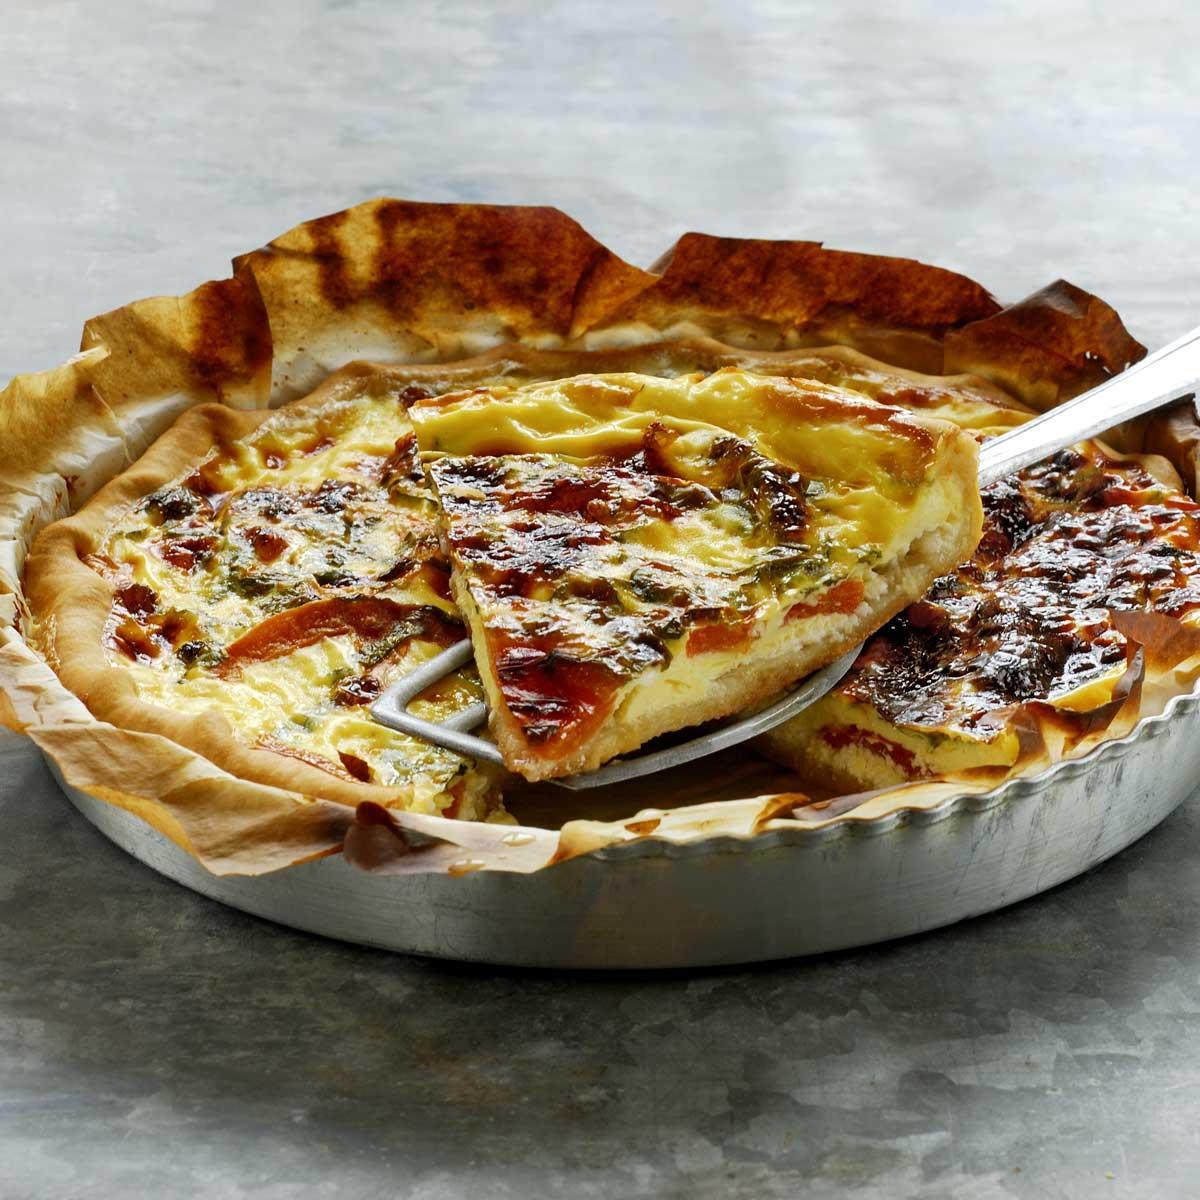 Recette quiche lorraine - Cuisine / Madame Figaro